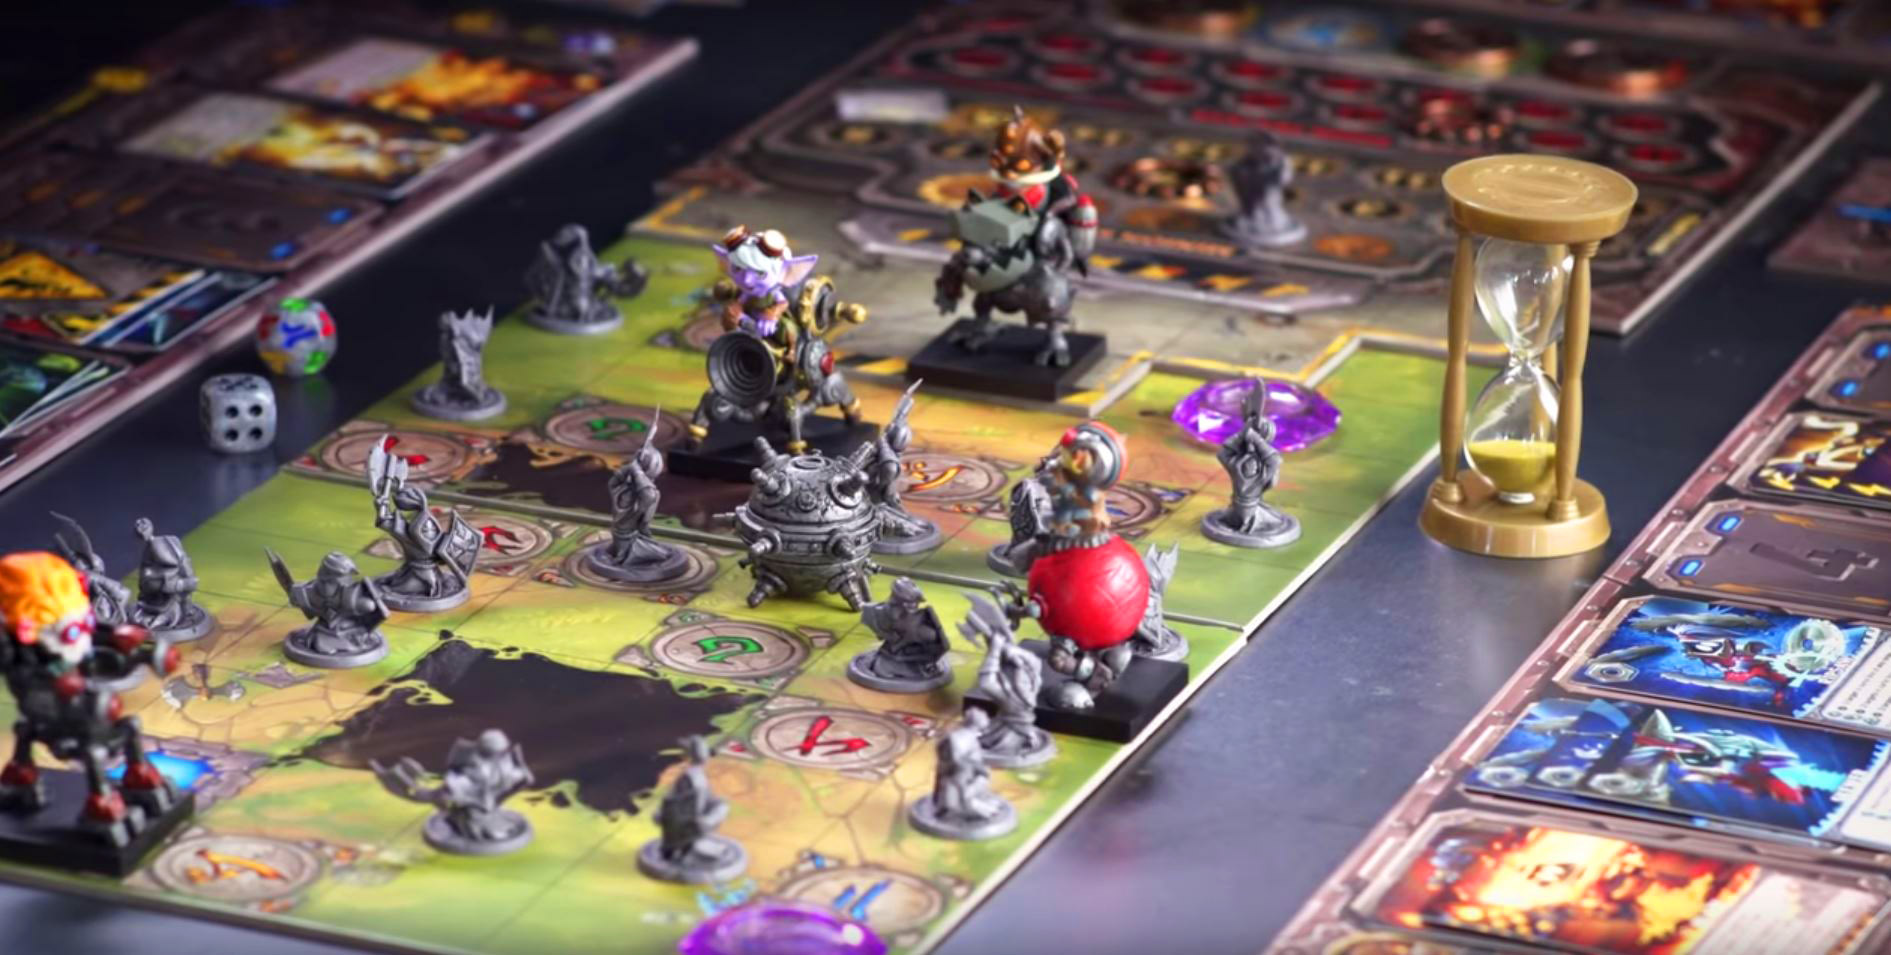 Mechs vs Minions: League of Legends bekommt ein Brettspiel mit Yordle-Power!